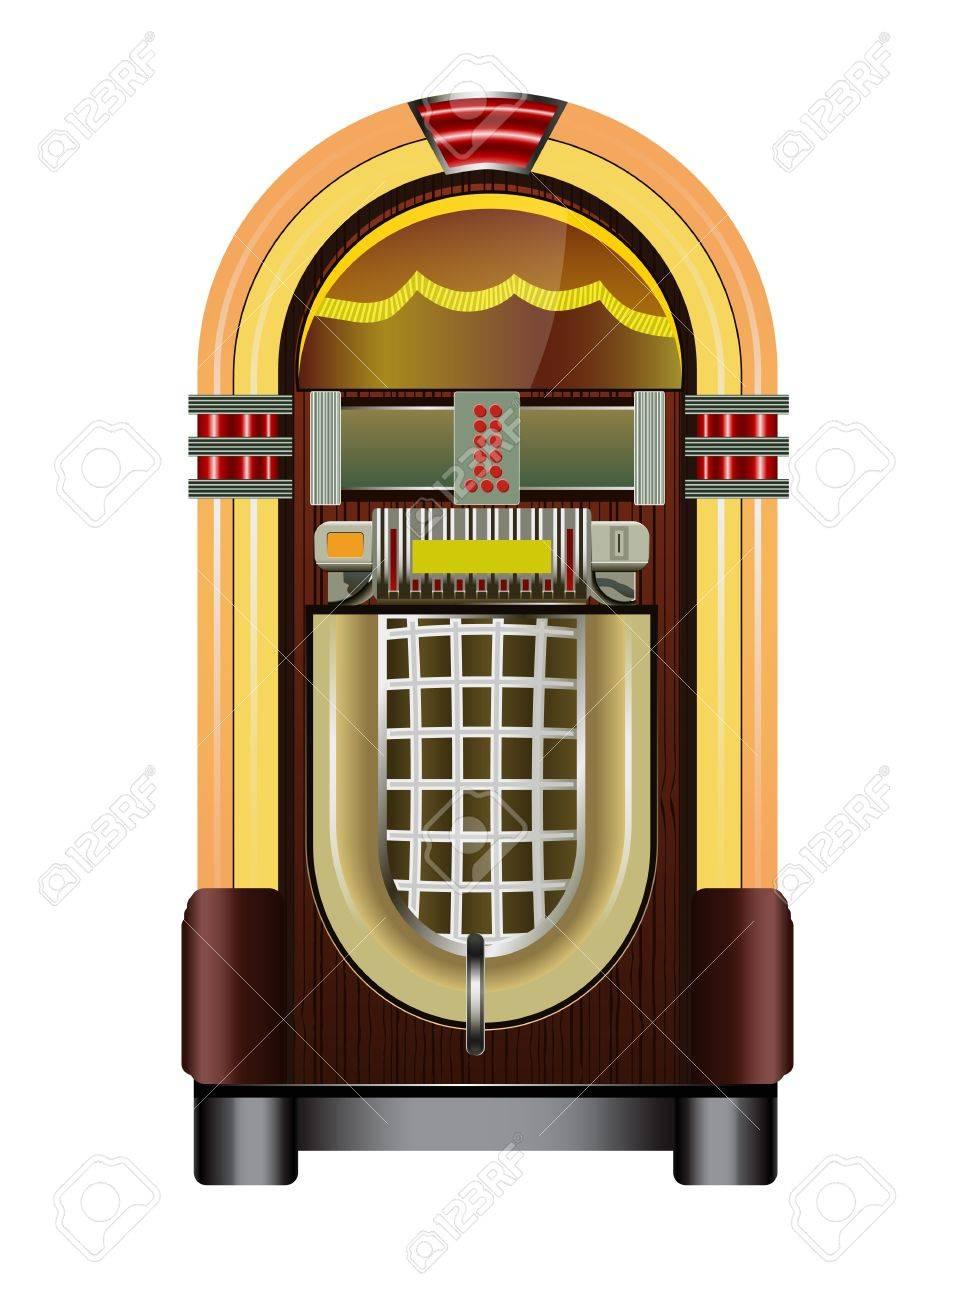 jukebox isolated on a white background - 11127488